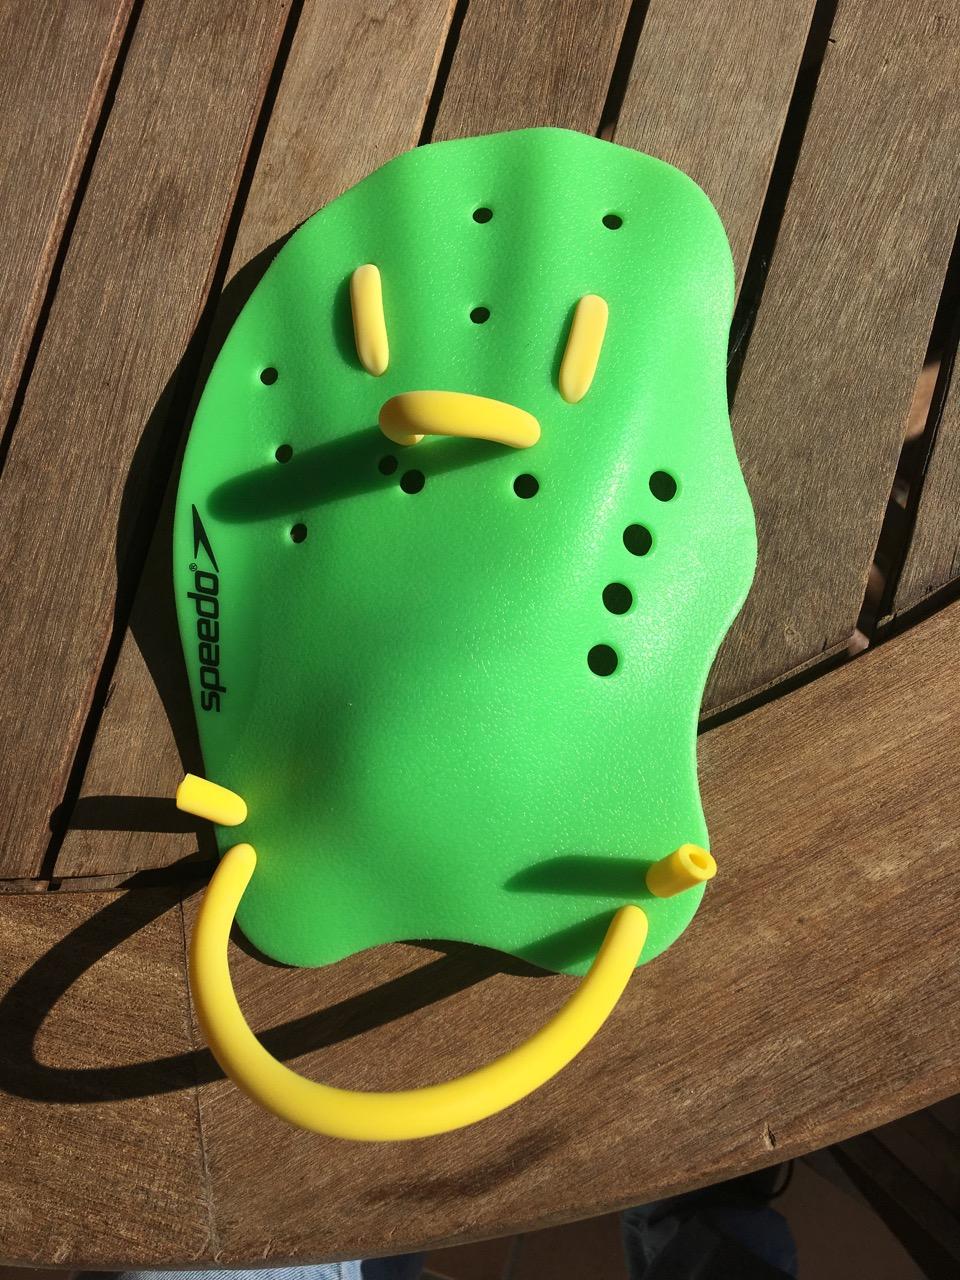 Swimrun paddles